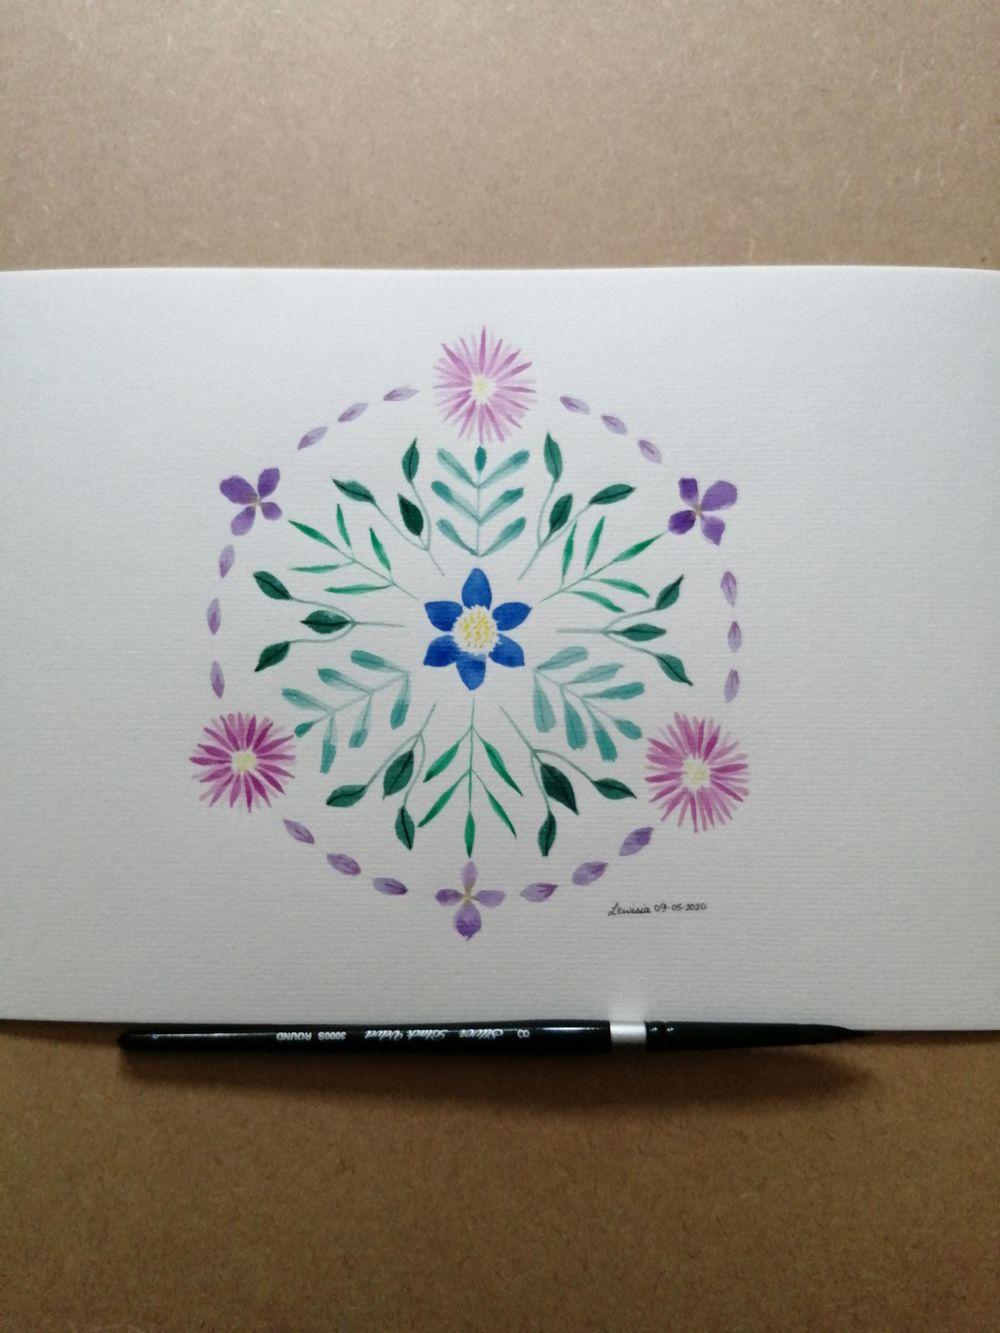 Flower mandala - image 1 - student project